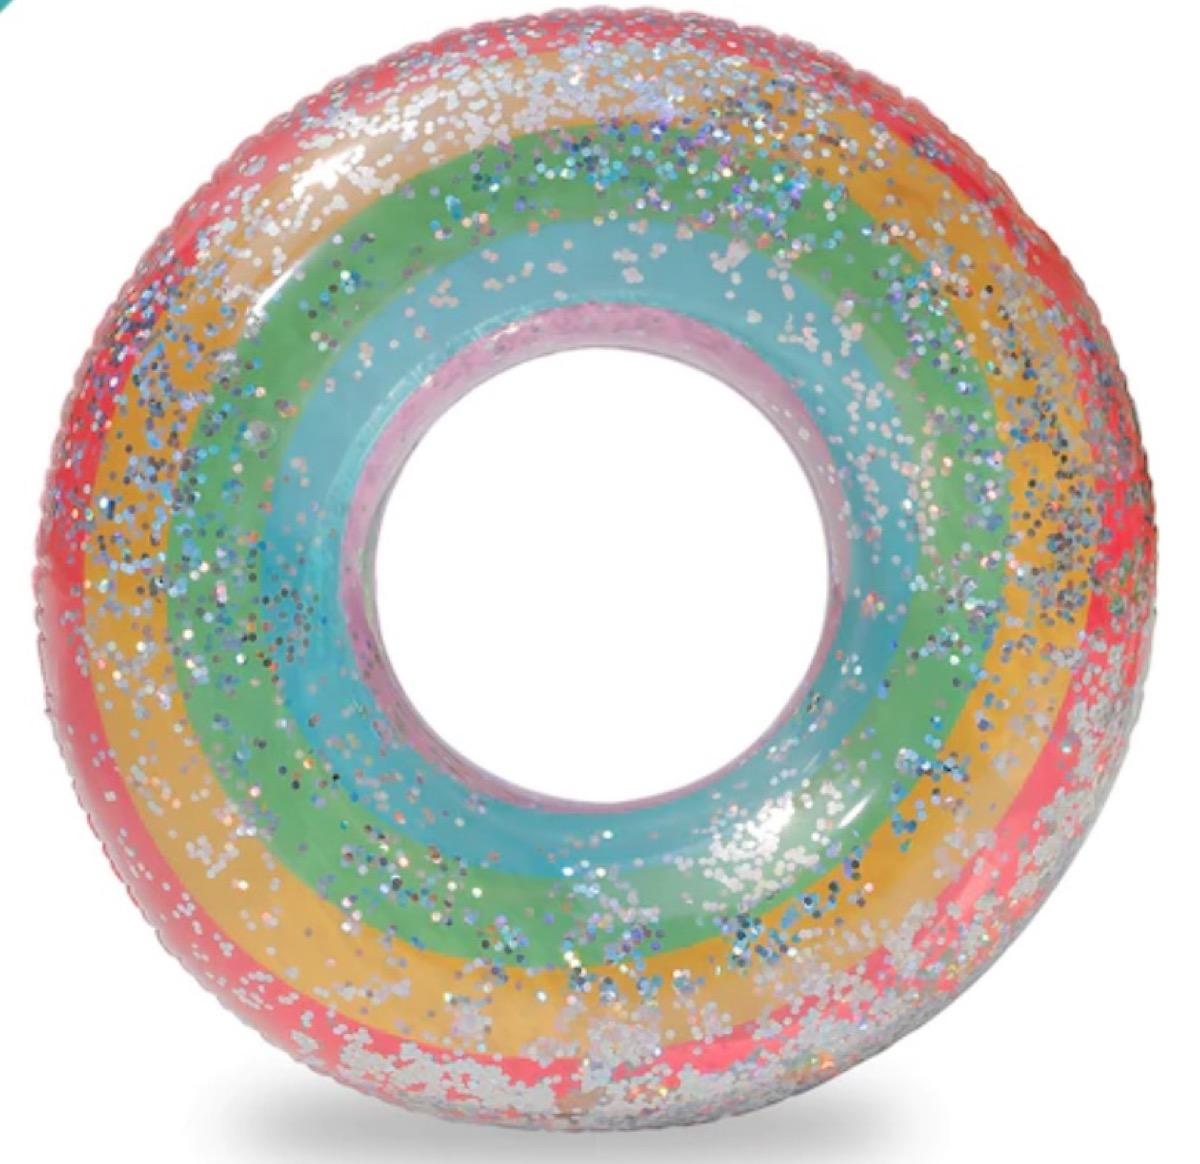 rainbow glitter inner tube, summer party essentials